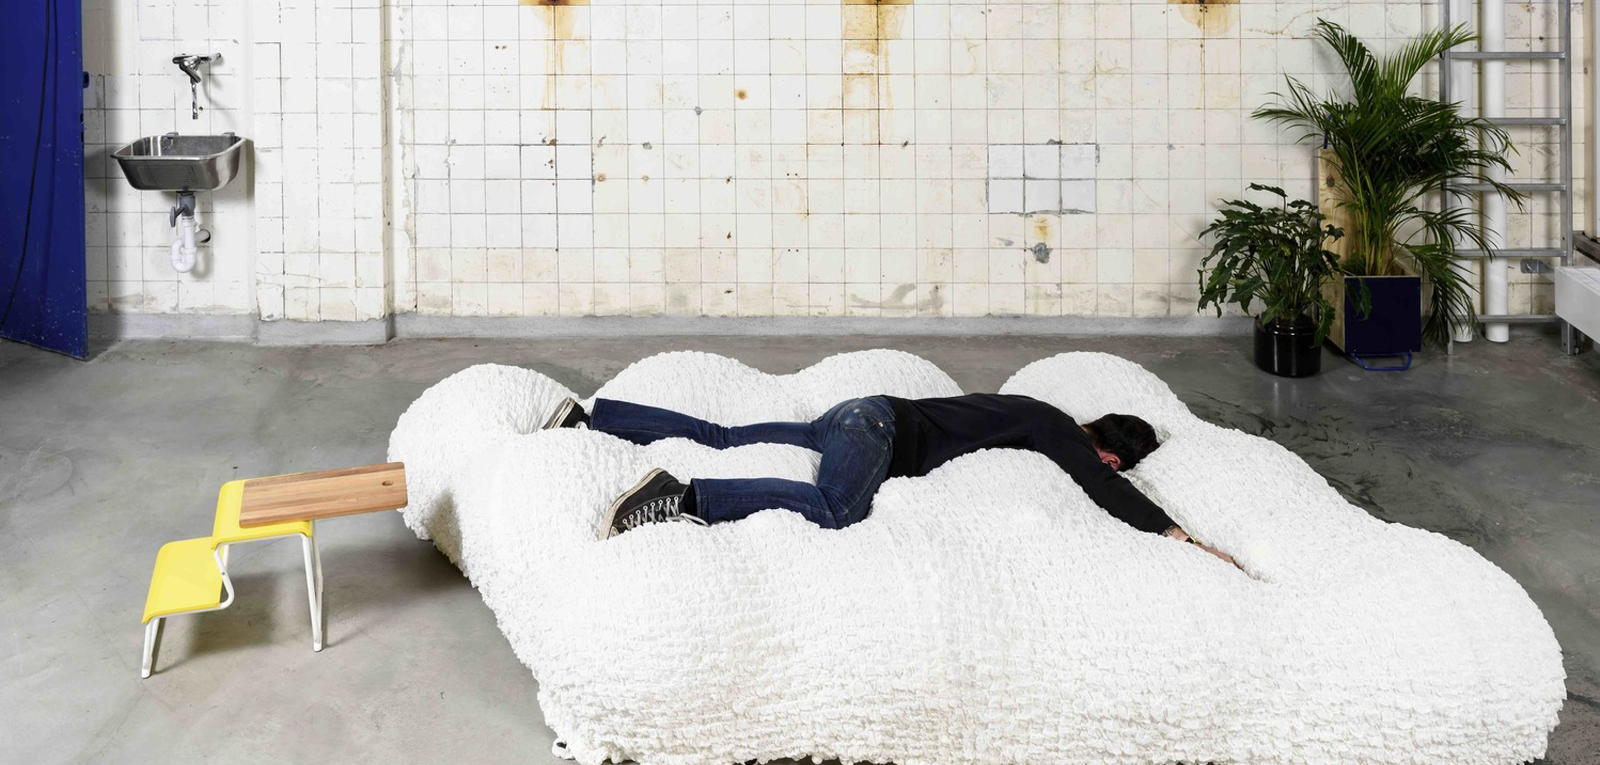 modular bathroom furniture rotating cabinet vibe designer. mcguire furniture company rain 2015 modular bathroom rotating cabinet vibe designer o